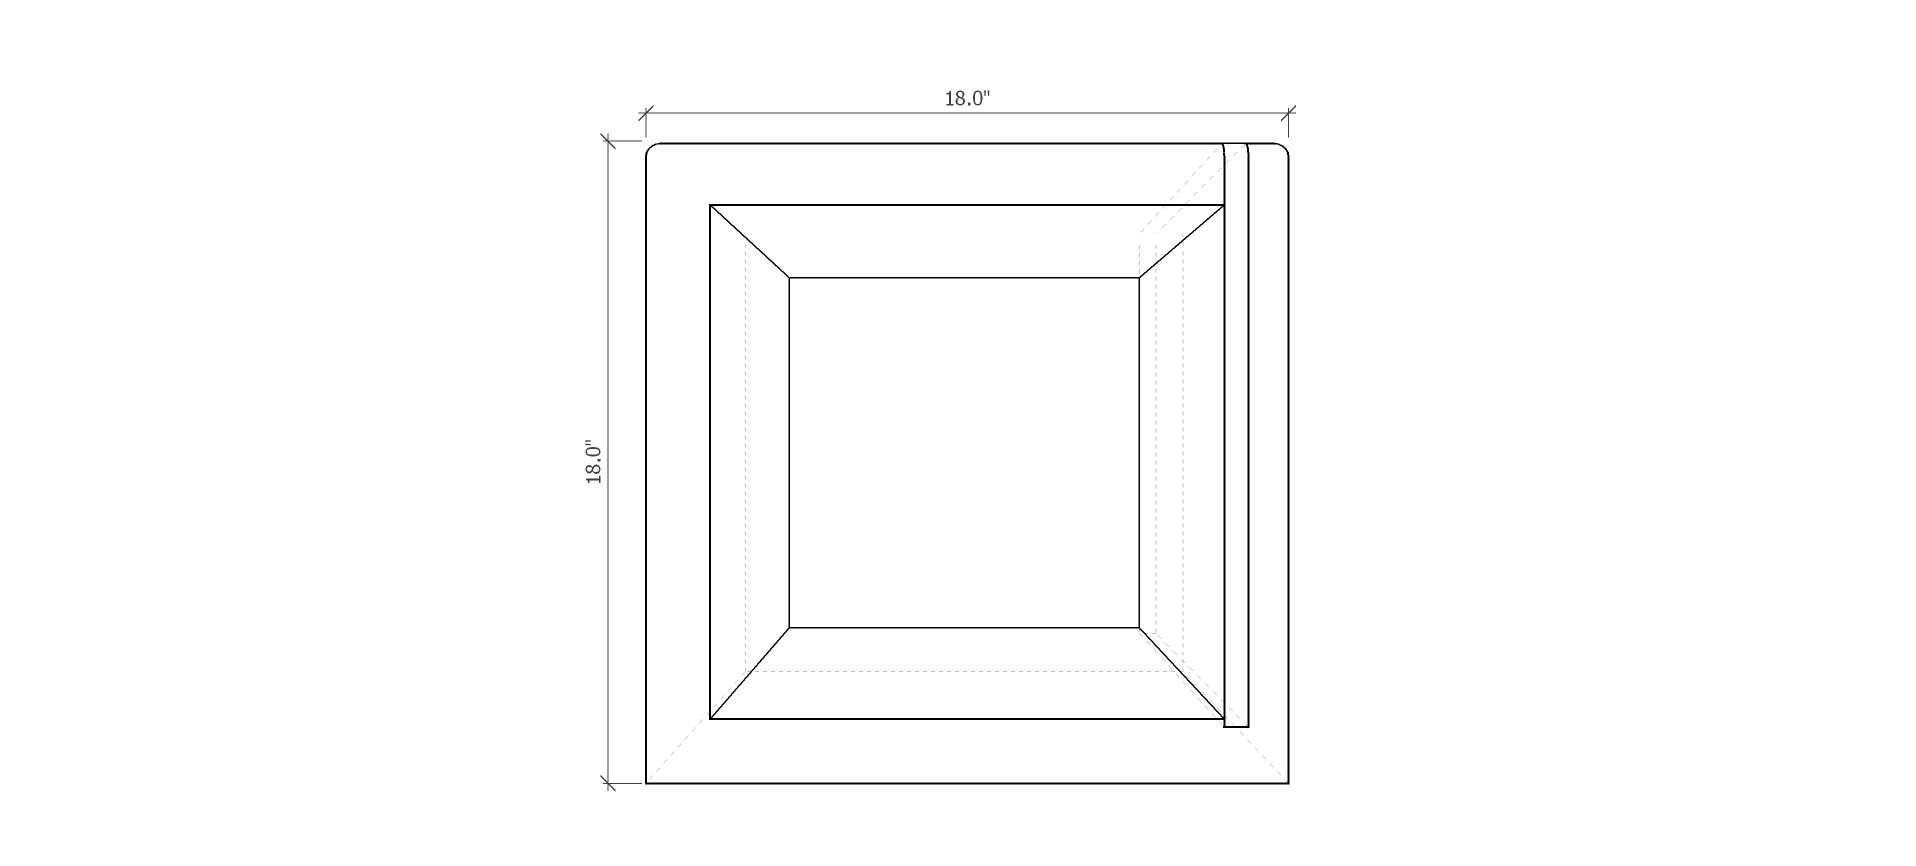 3 - flex - front.jpg